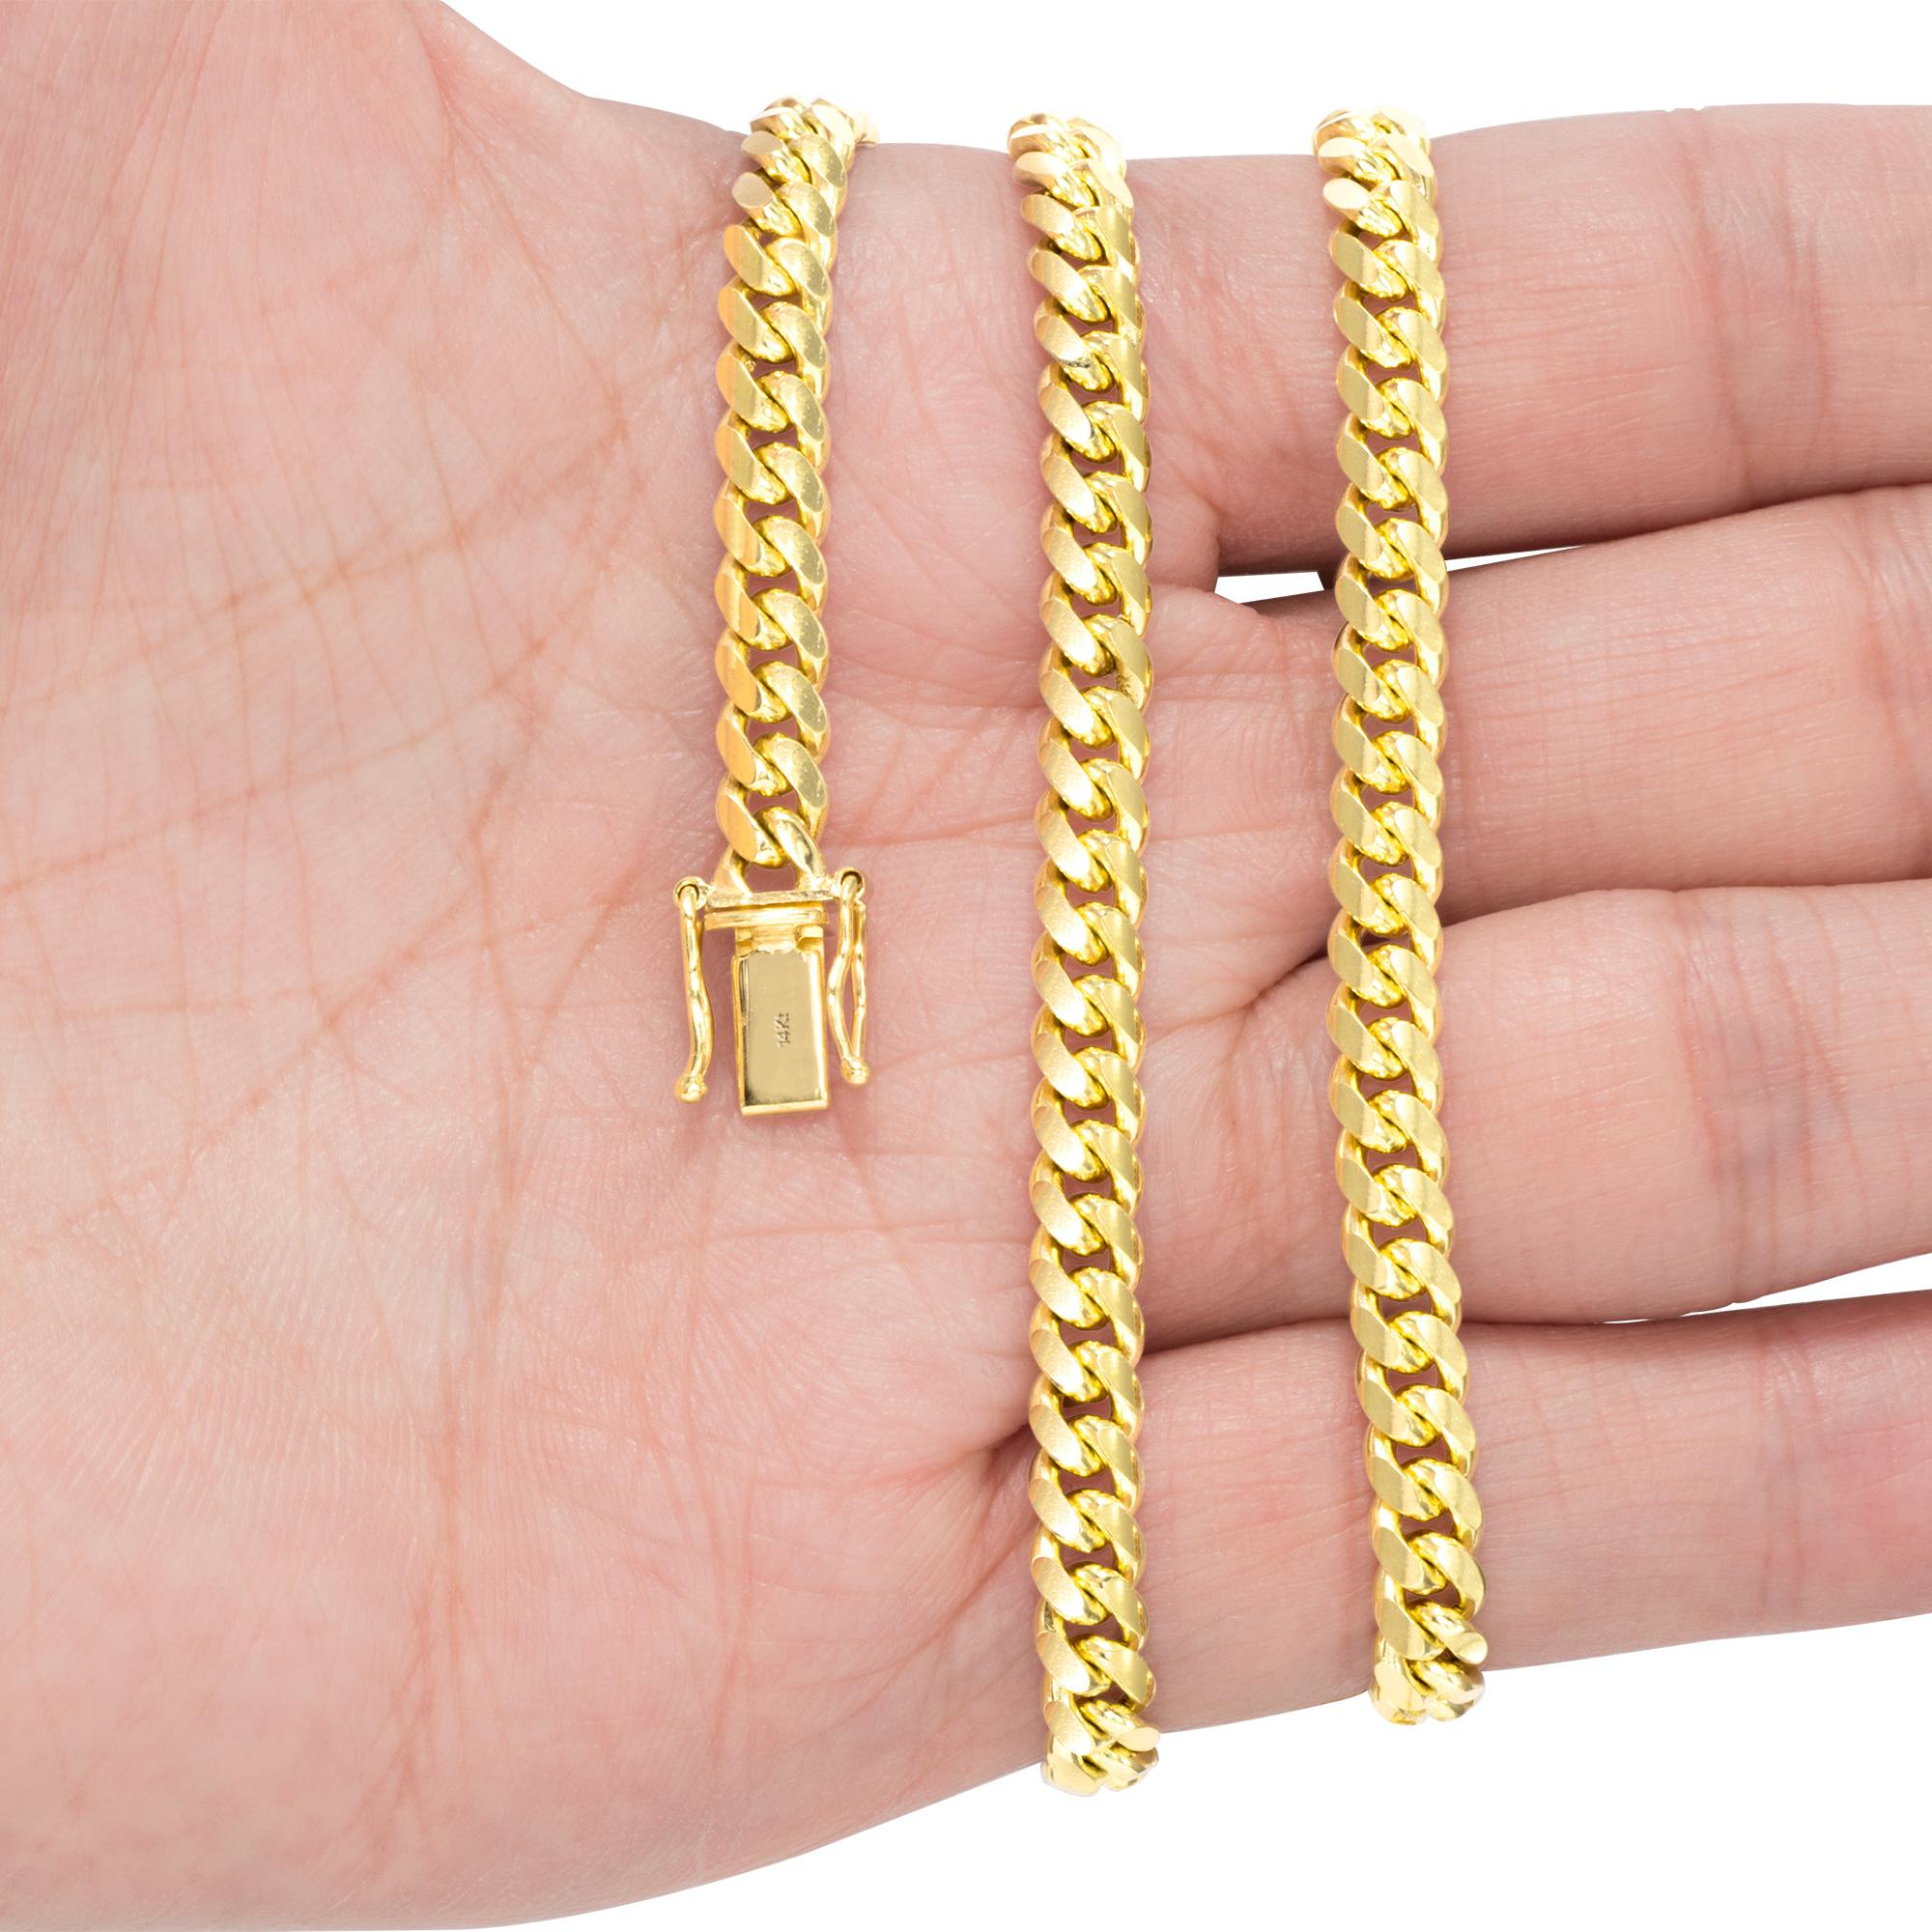 14K-Yellow-Gold-Solid-2-7mm-11mm-Miami-Cuban-Link-Chain-Bracelet-Men-Women-7-034-9-034 thumbnail 19